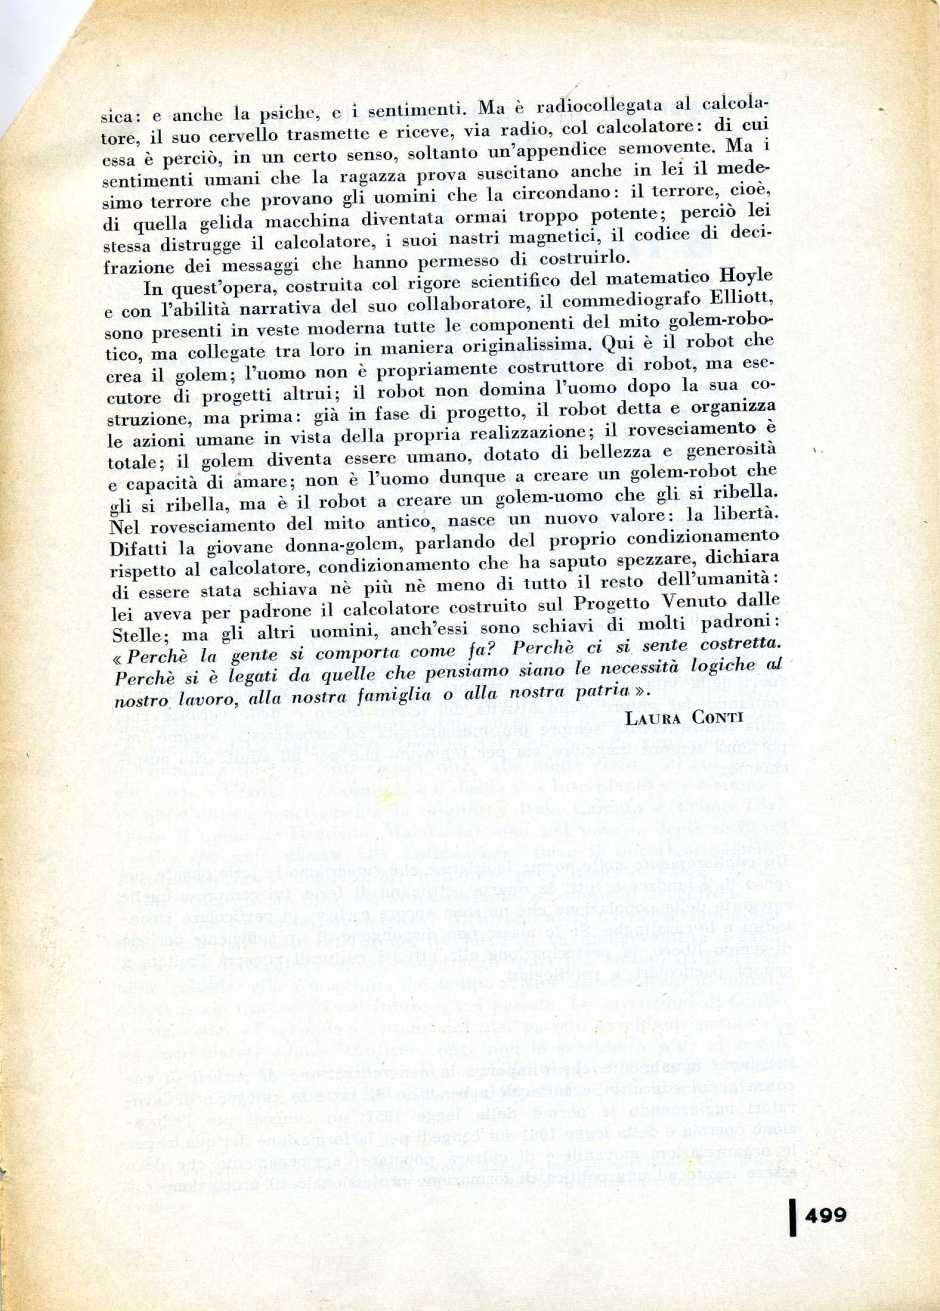 L  CONTI FANTASCIENZA1983